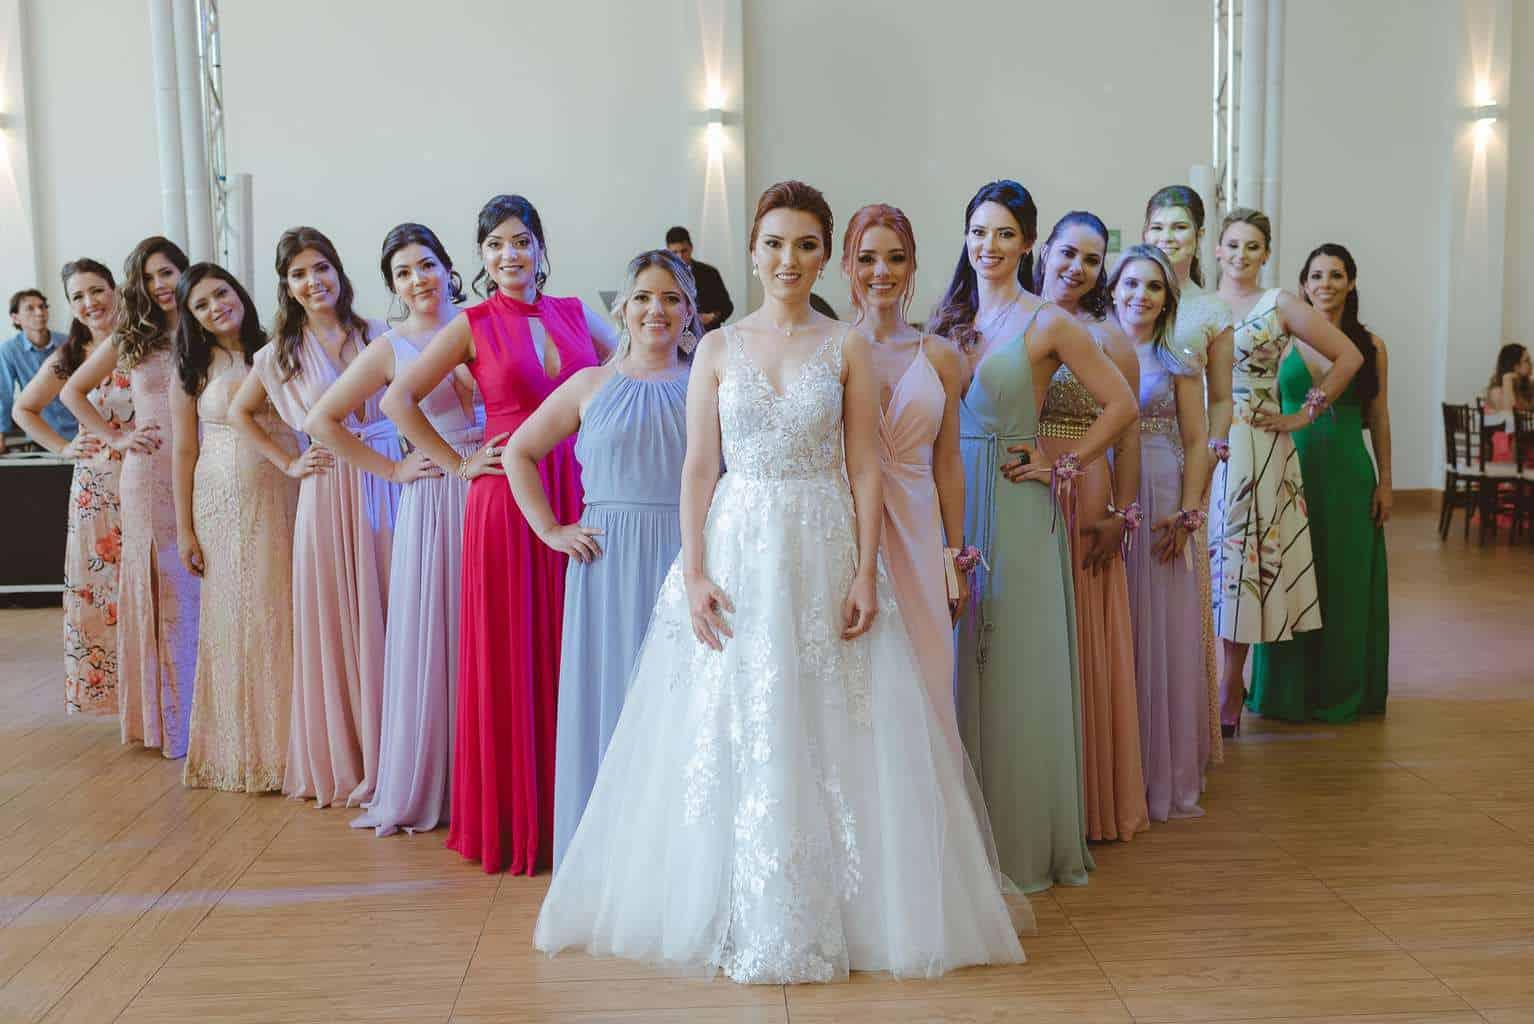 casamento-ao-ar-livre-casamento-boho-casamento-geek-casamento-rustico-casamento-Thais-e-Pedro-Revoar-Fotografia-Villa-Borghese-Eventos-61